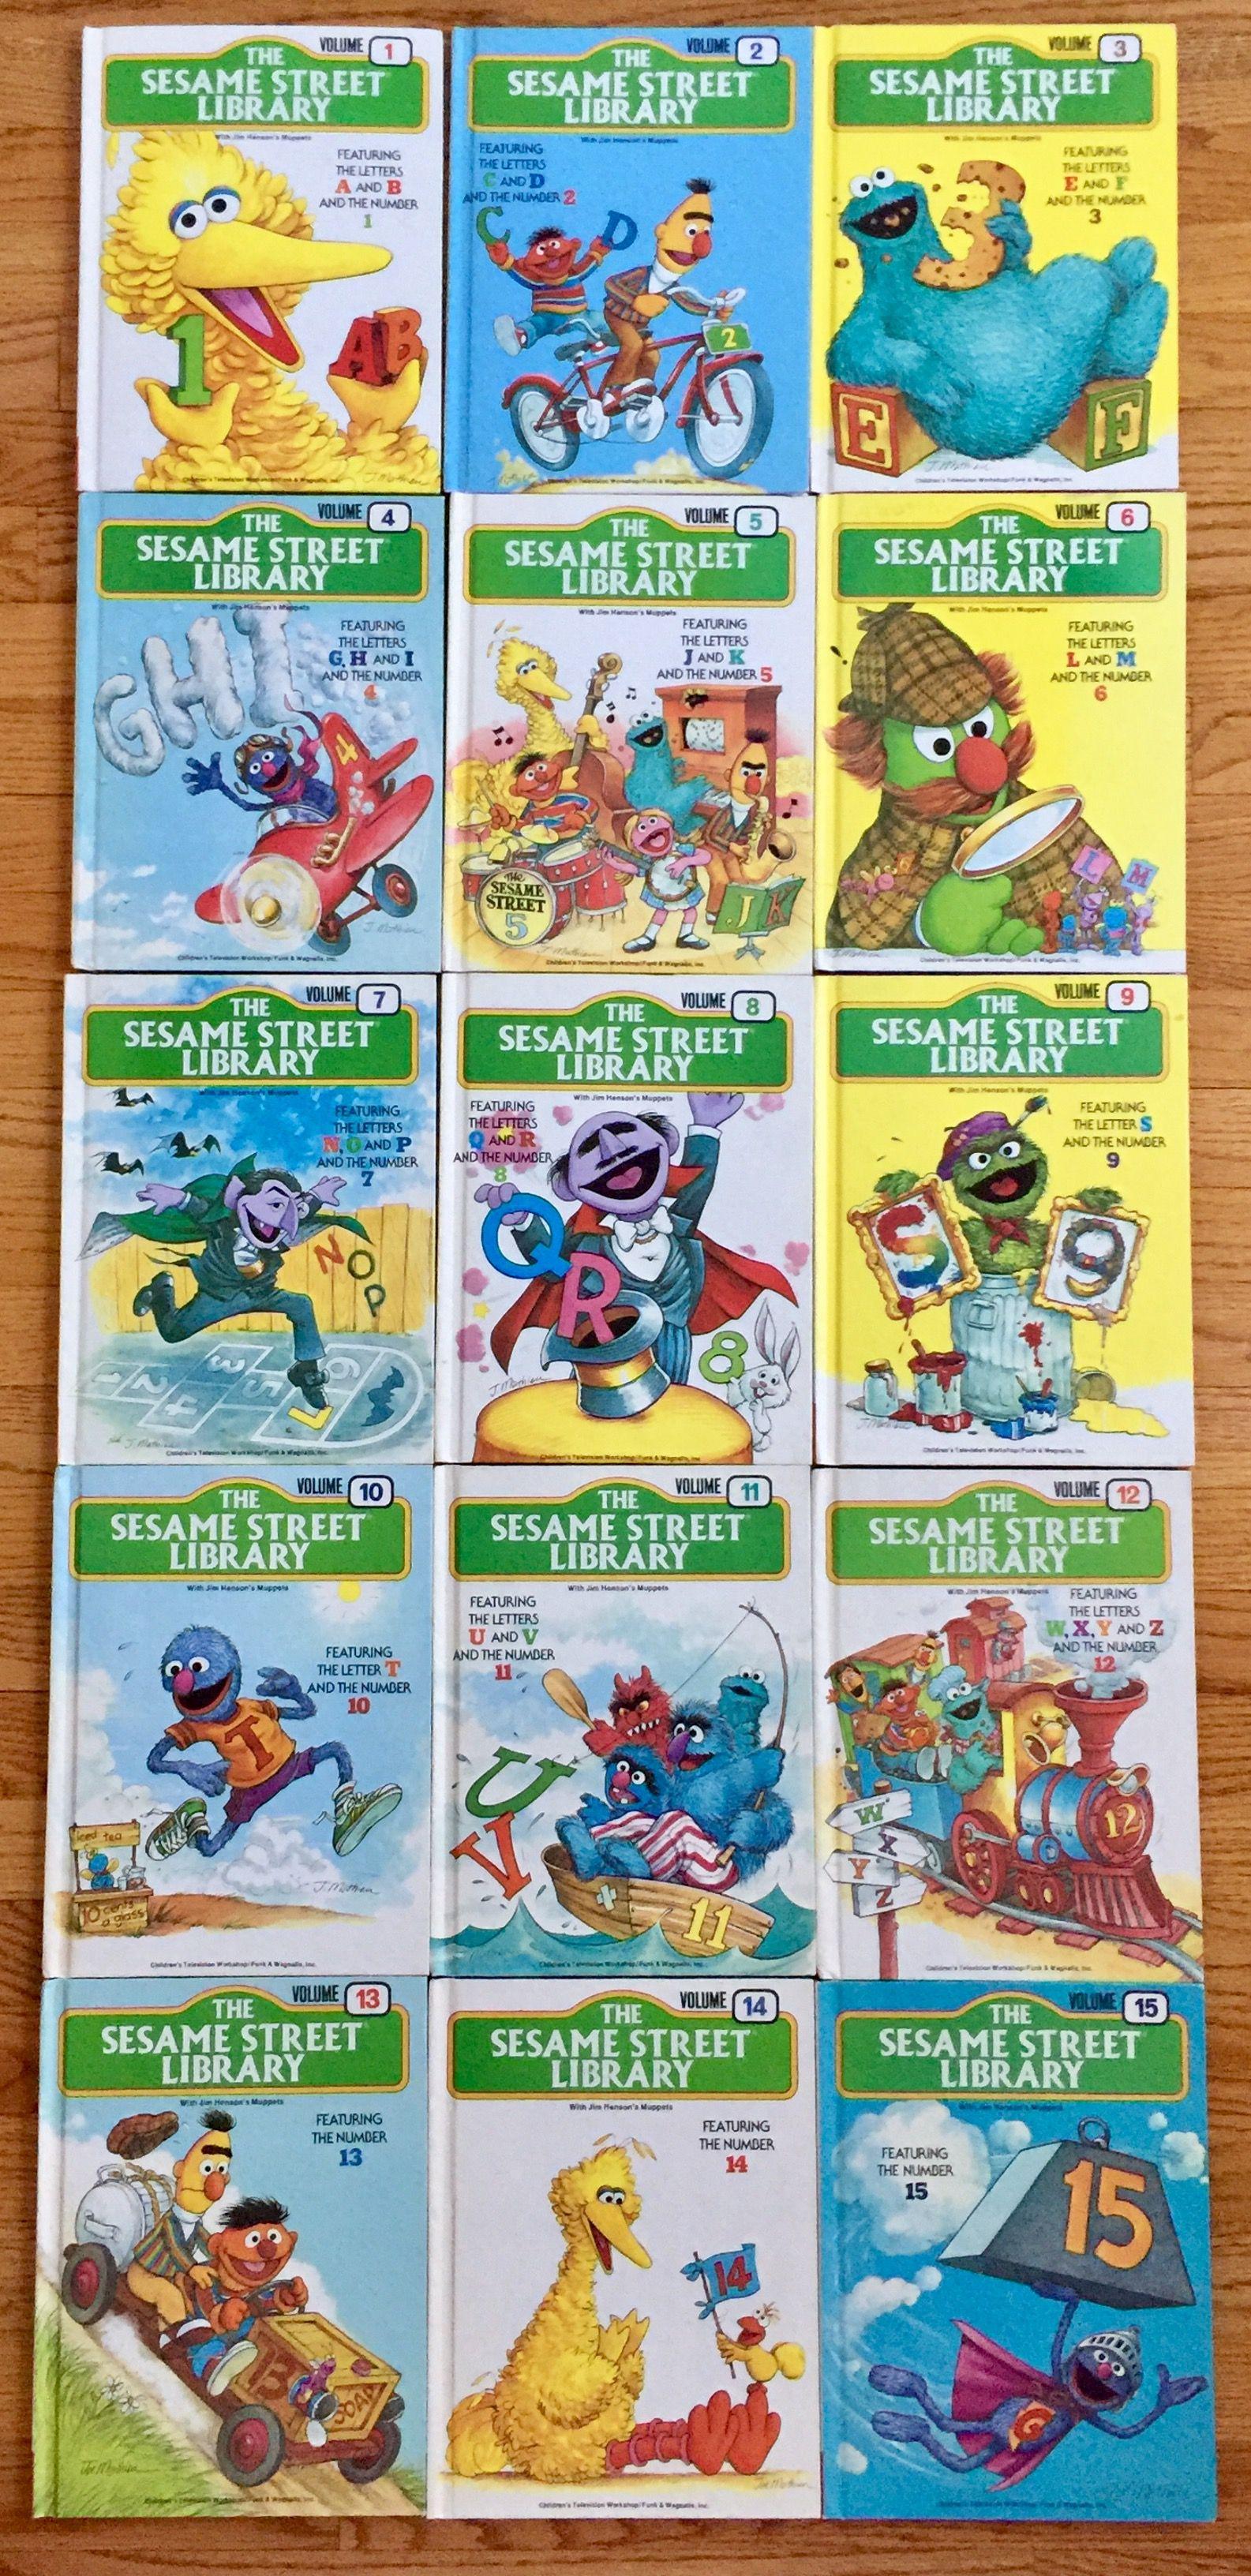 1978 sesame street library complete 15 volume set